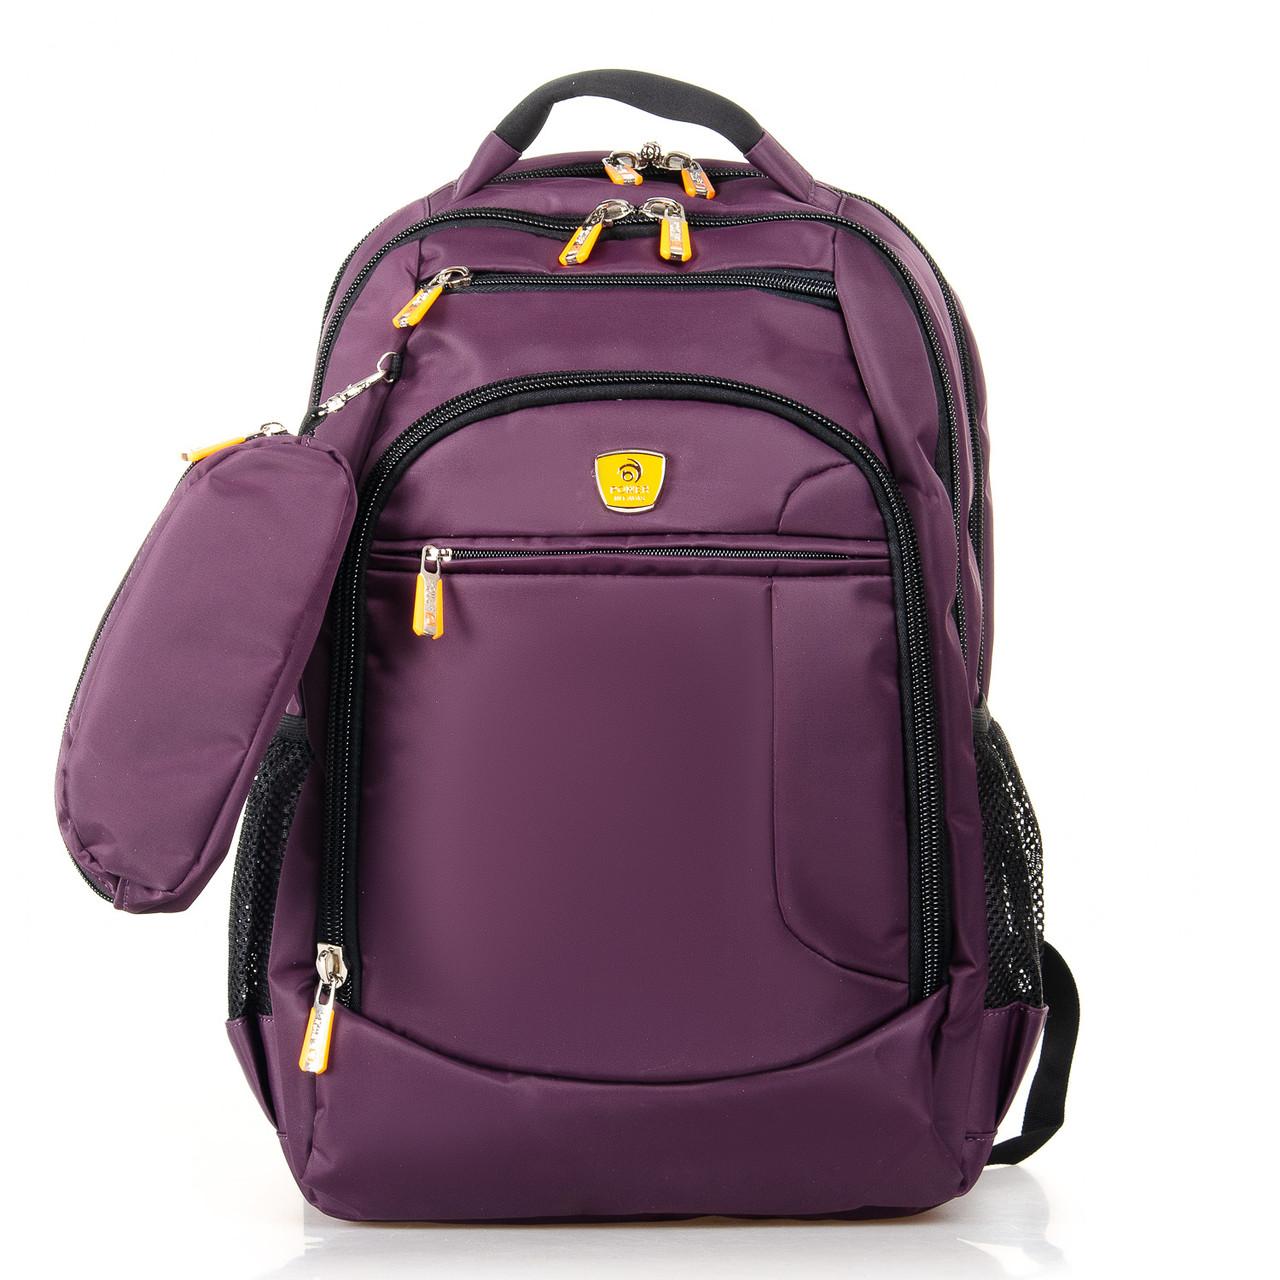 Рюкзак міський Power In Eavas 5143 violet з кишенею для ноутбука